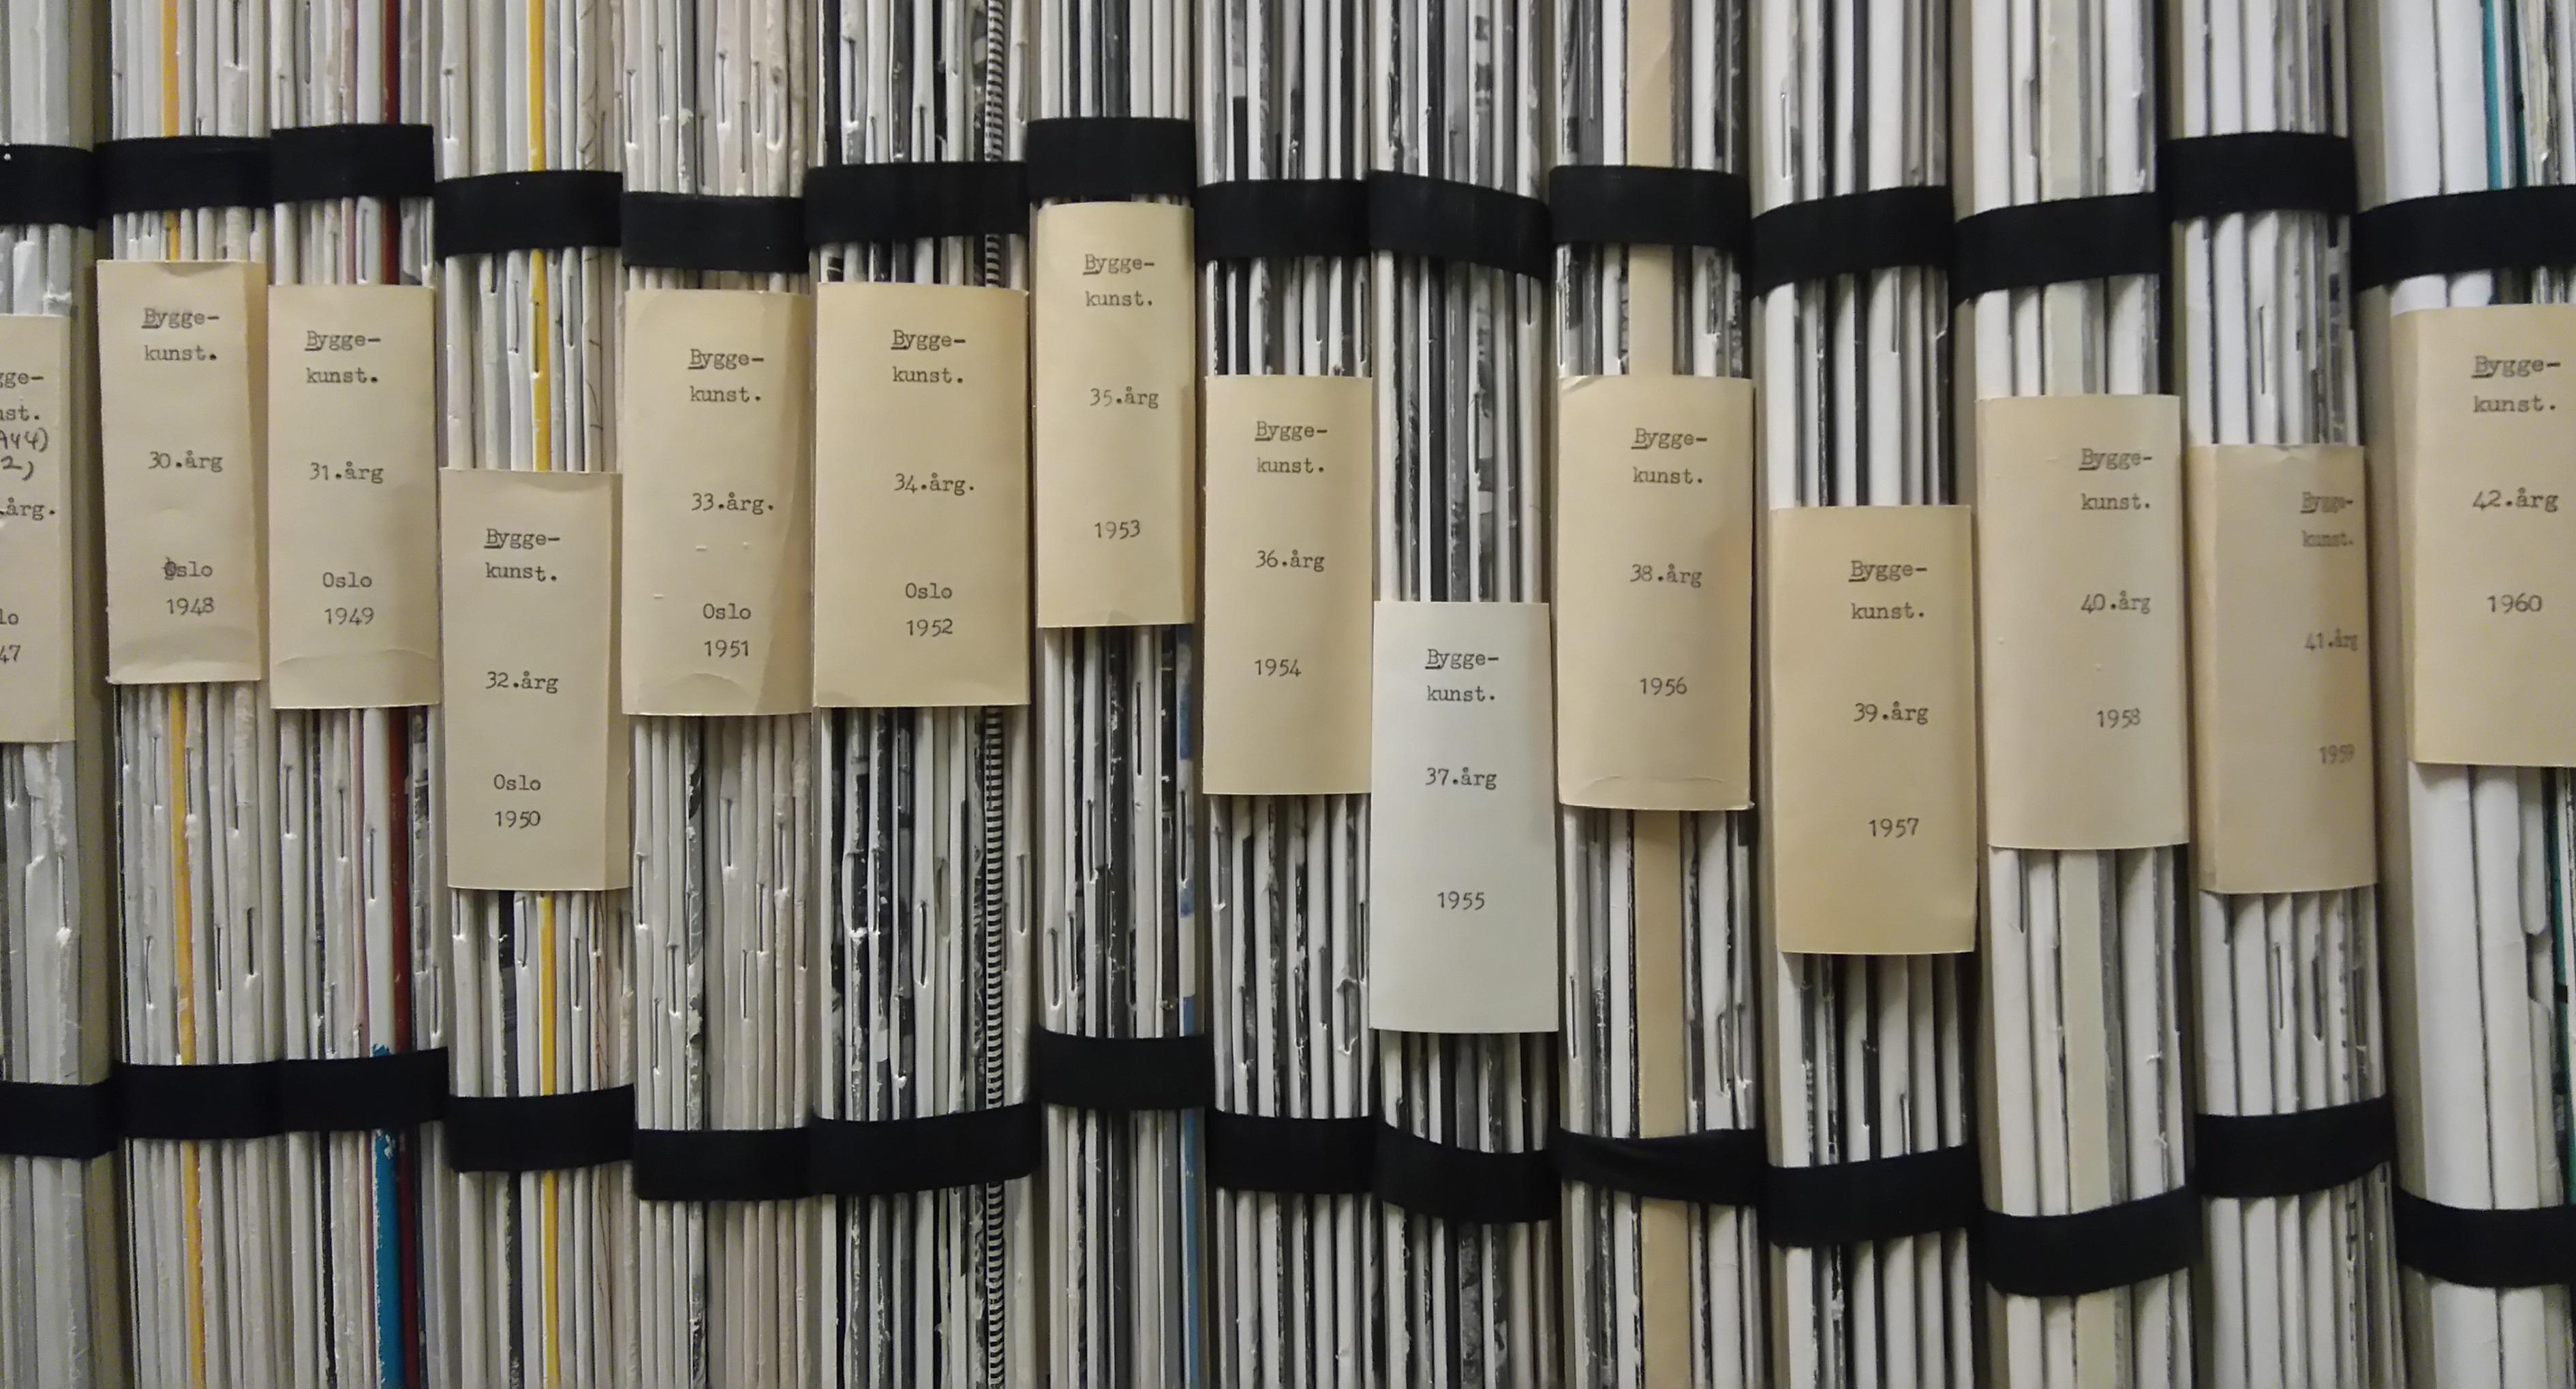 Biblioteket-Byggekunst-3.jpg#asset:1201